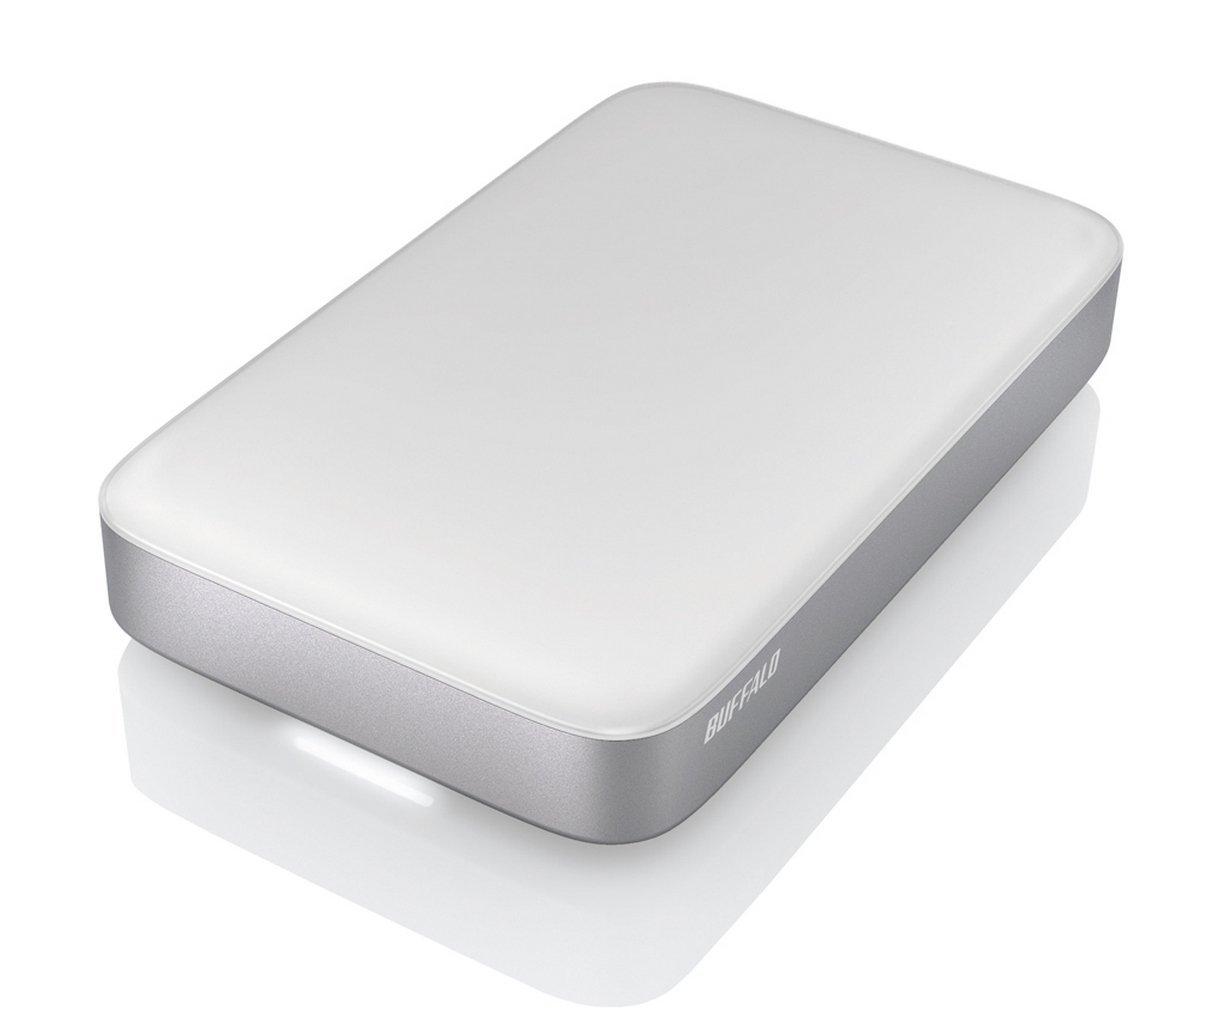 BUFFALO 128GB MINISTATION SSD